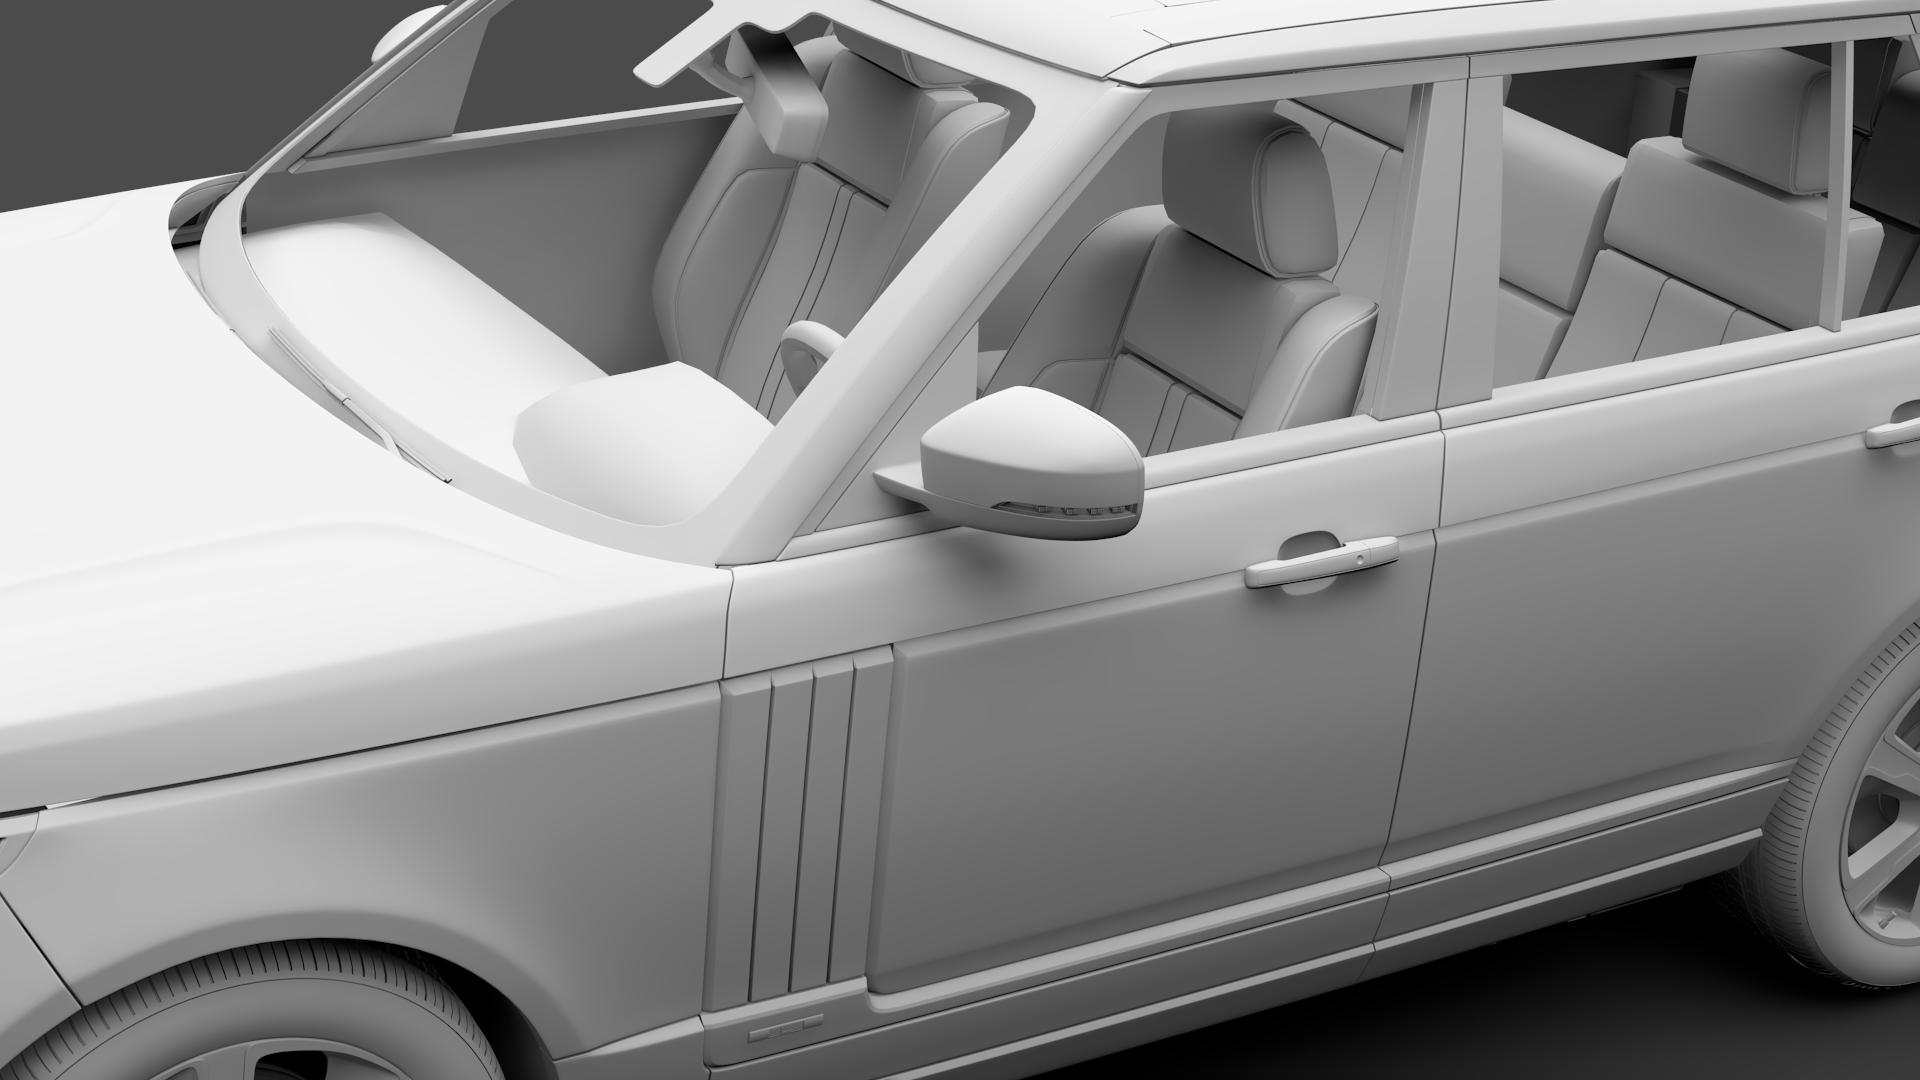 range rover hybrid lwb l405 2018 3d model max fbx c4d lwo ma mb hrc xsi obj 277428